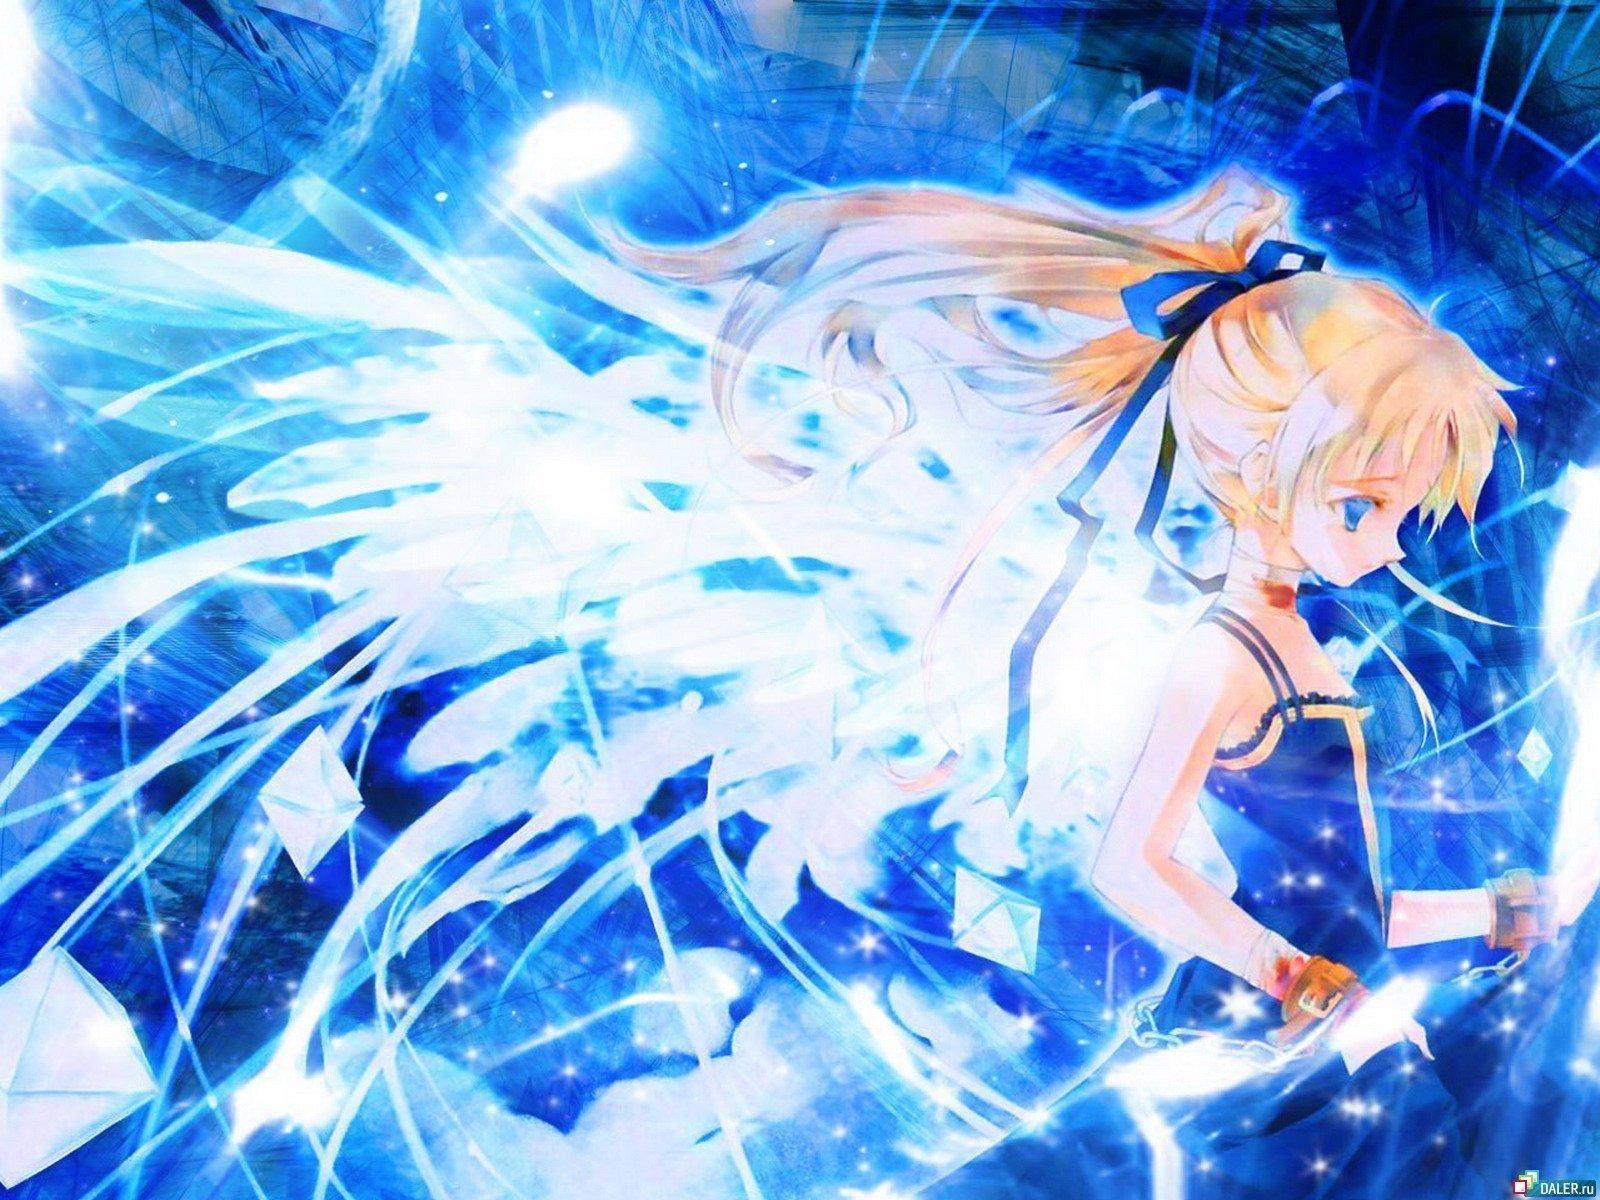 Blue Anime Wallpaper - WallpaperSafari